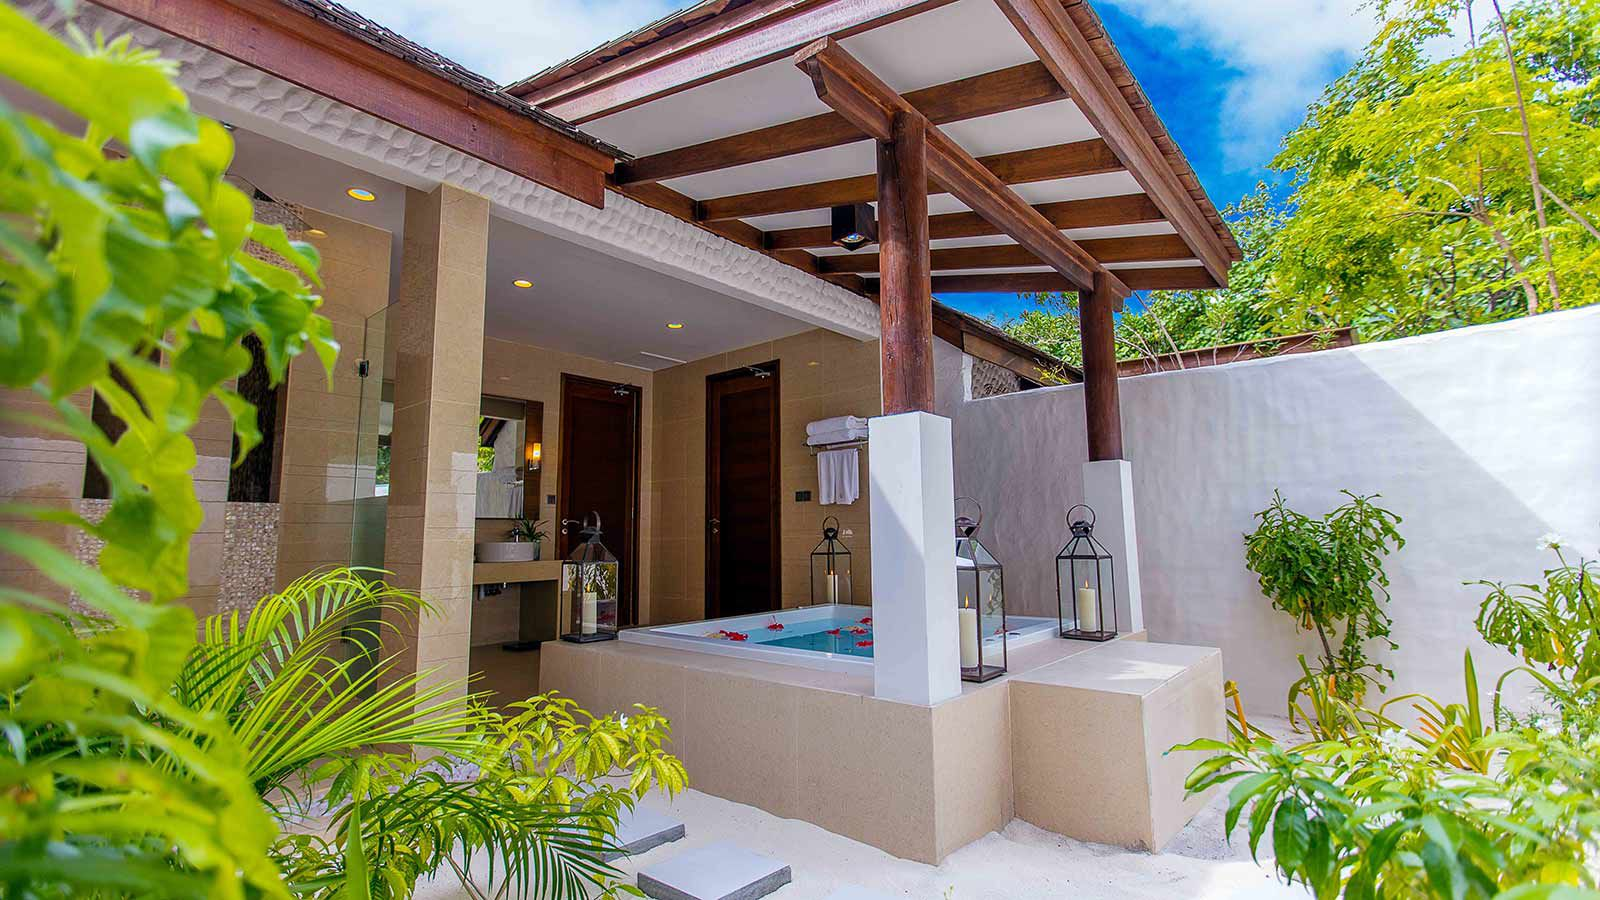 luxury villa maldives beach - photo #28